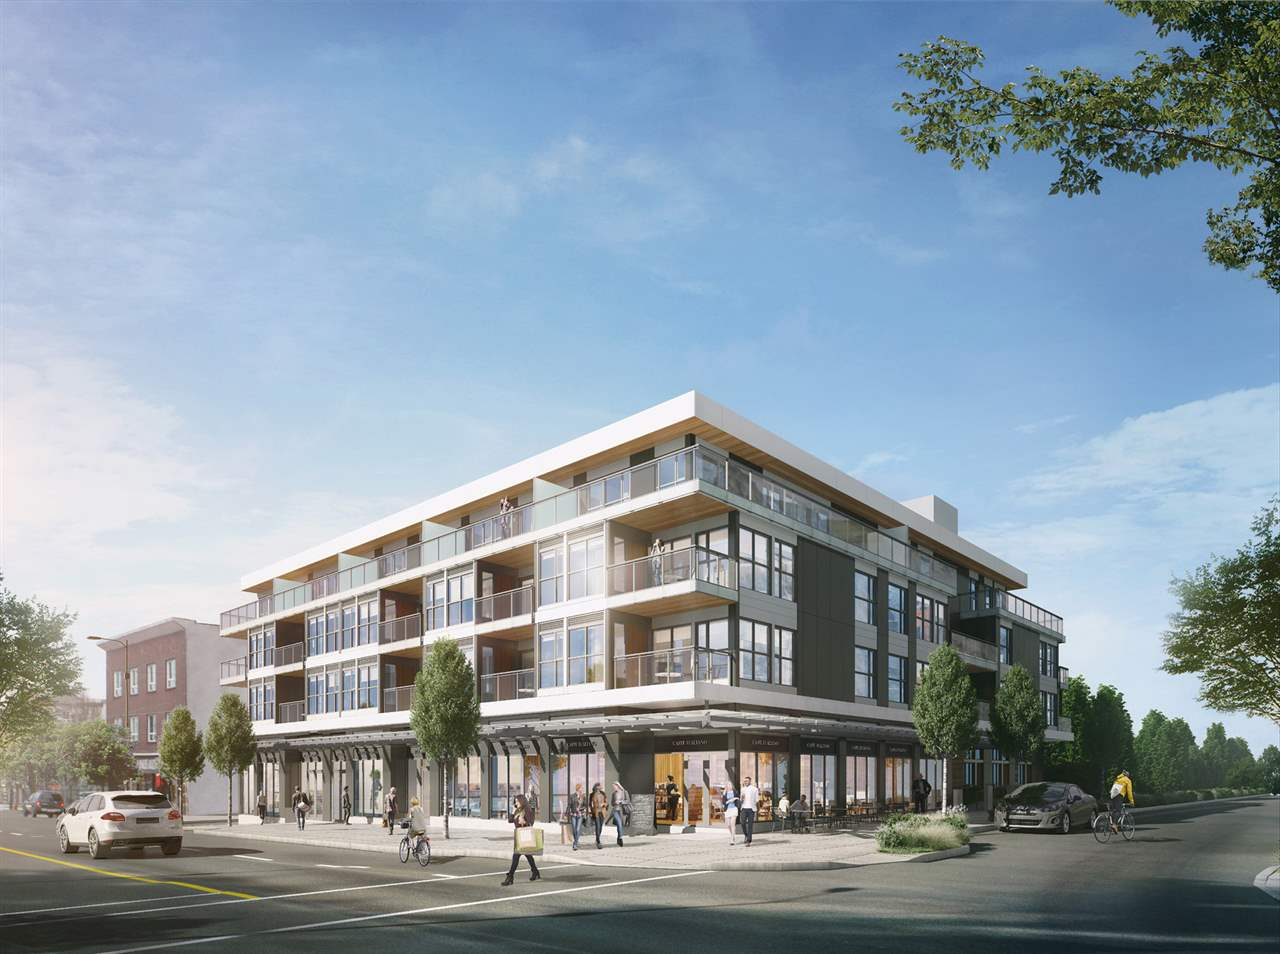 Buliding: 209 East 20th Avenue, Vancouver, BC